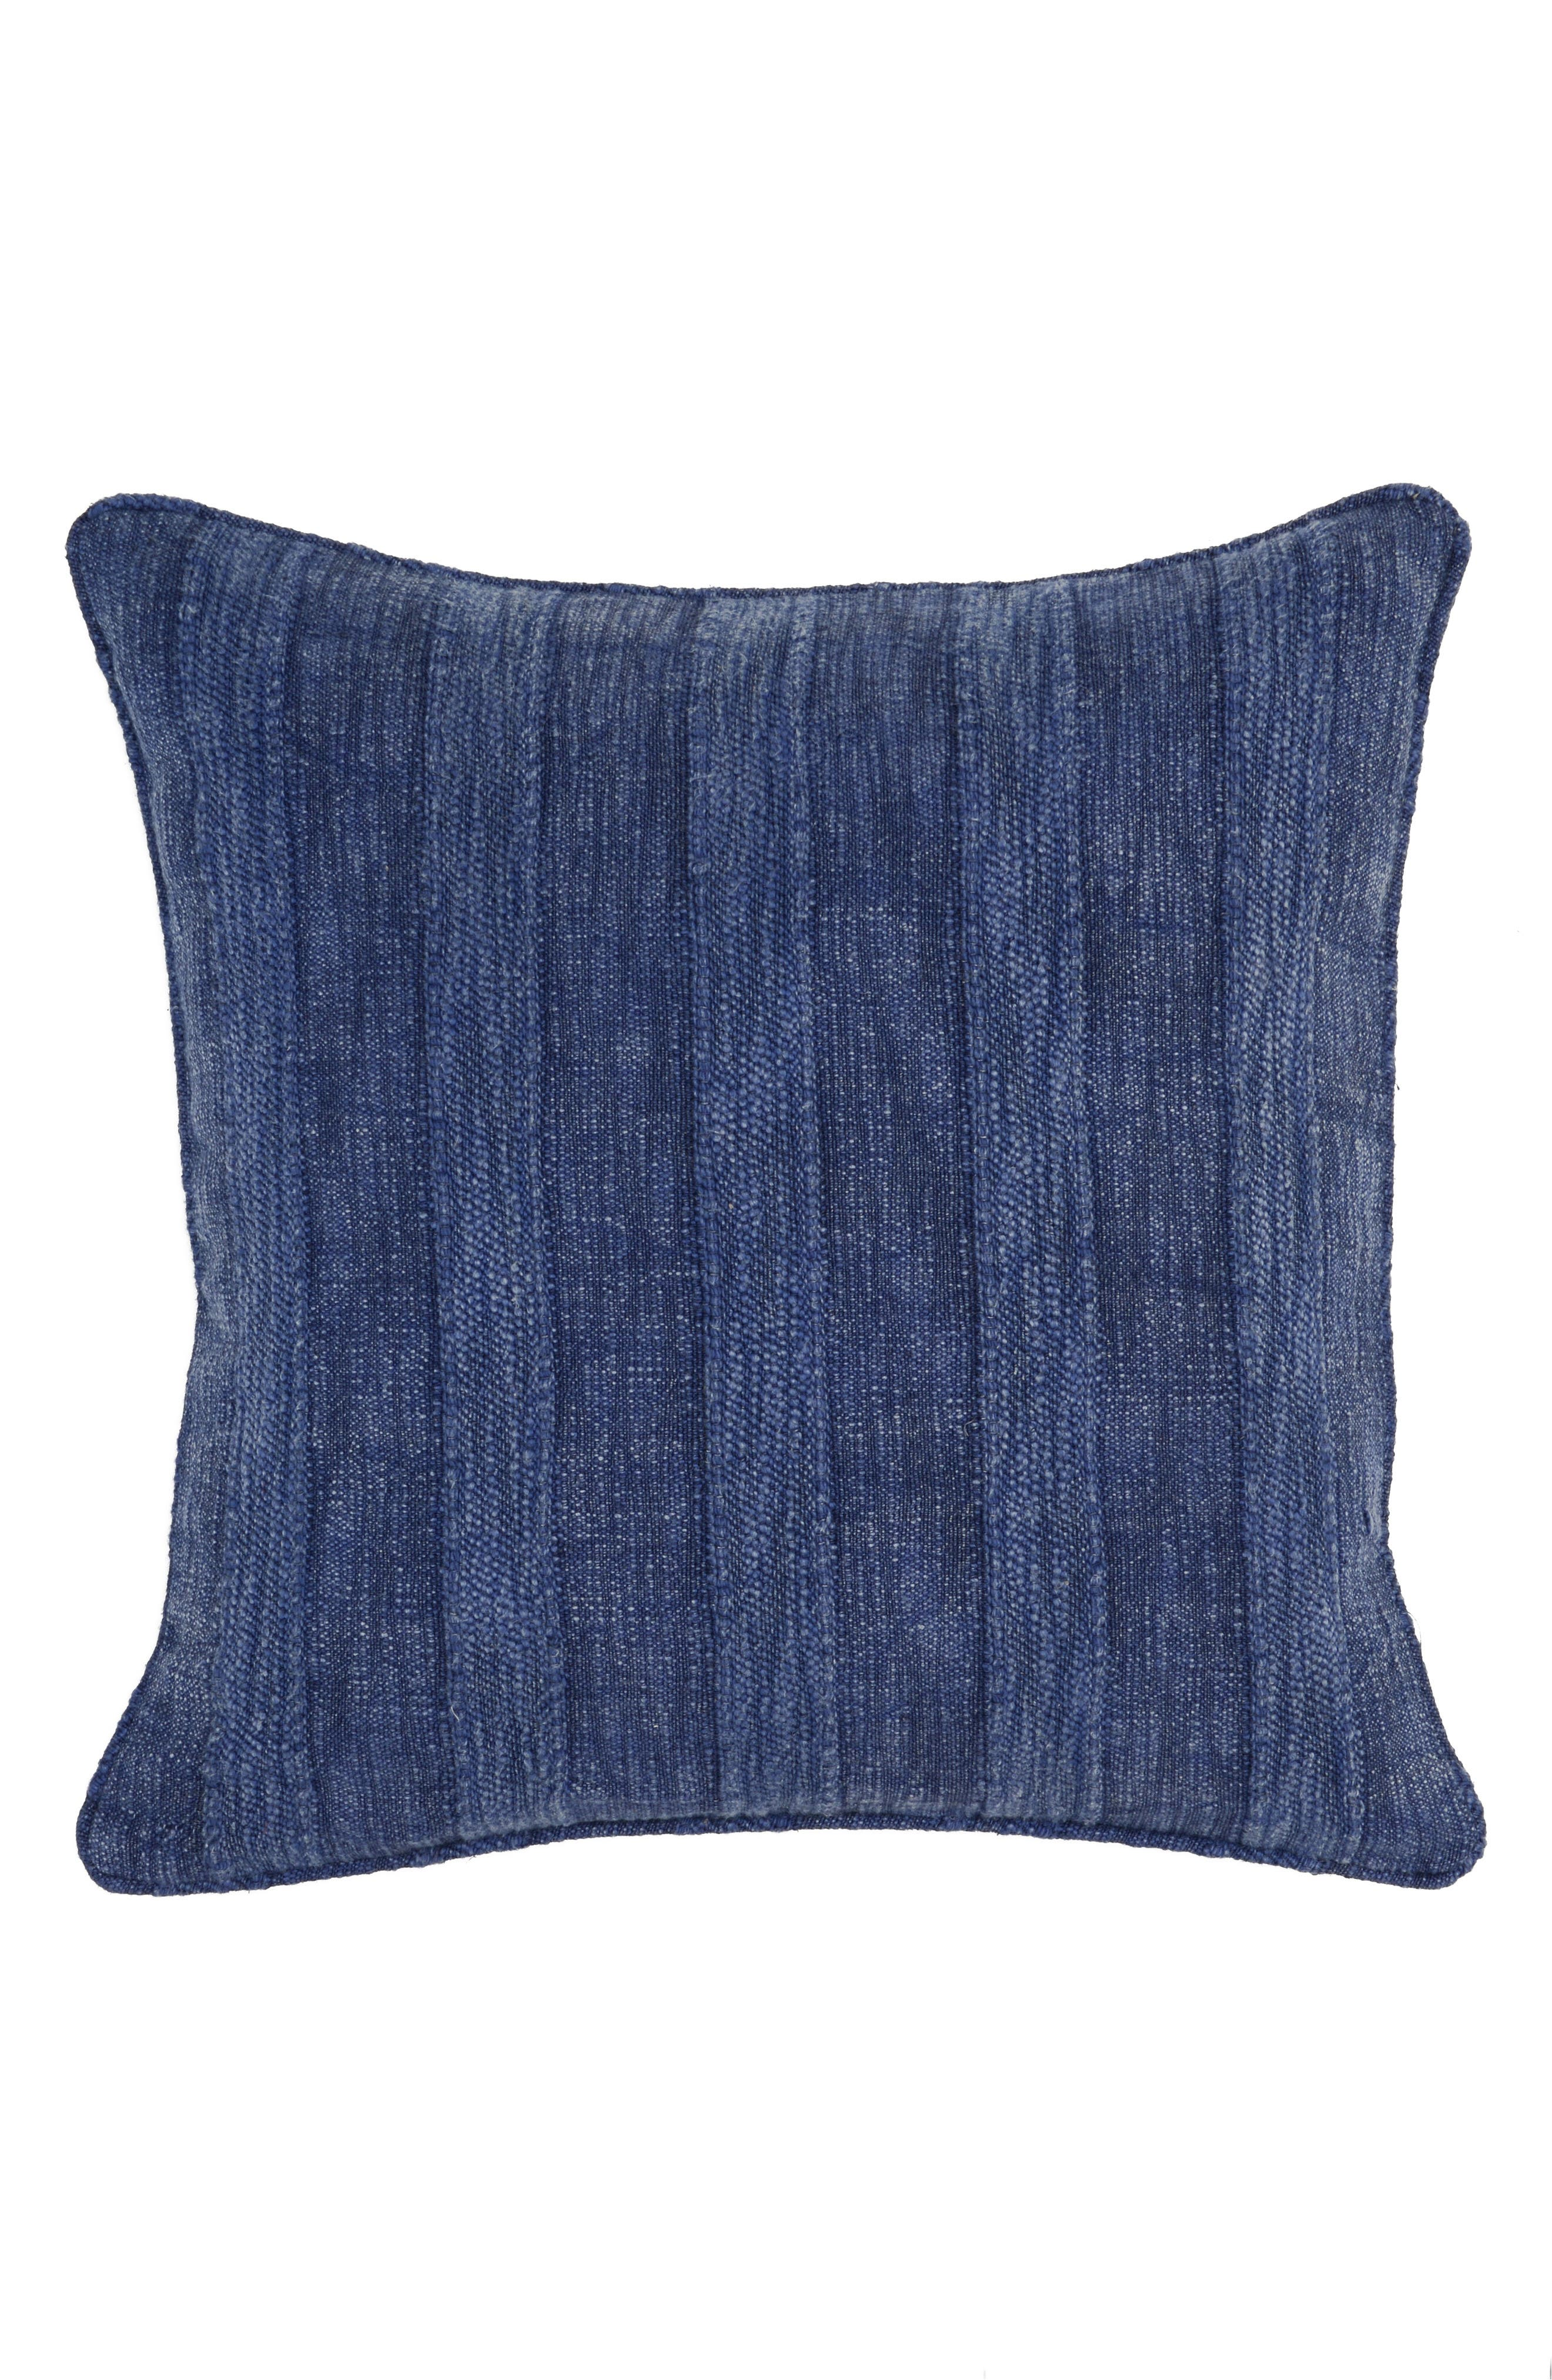 Heirloom Pillow,                             Main thumbnail 1, color,